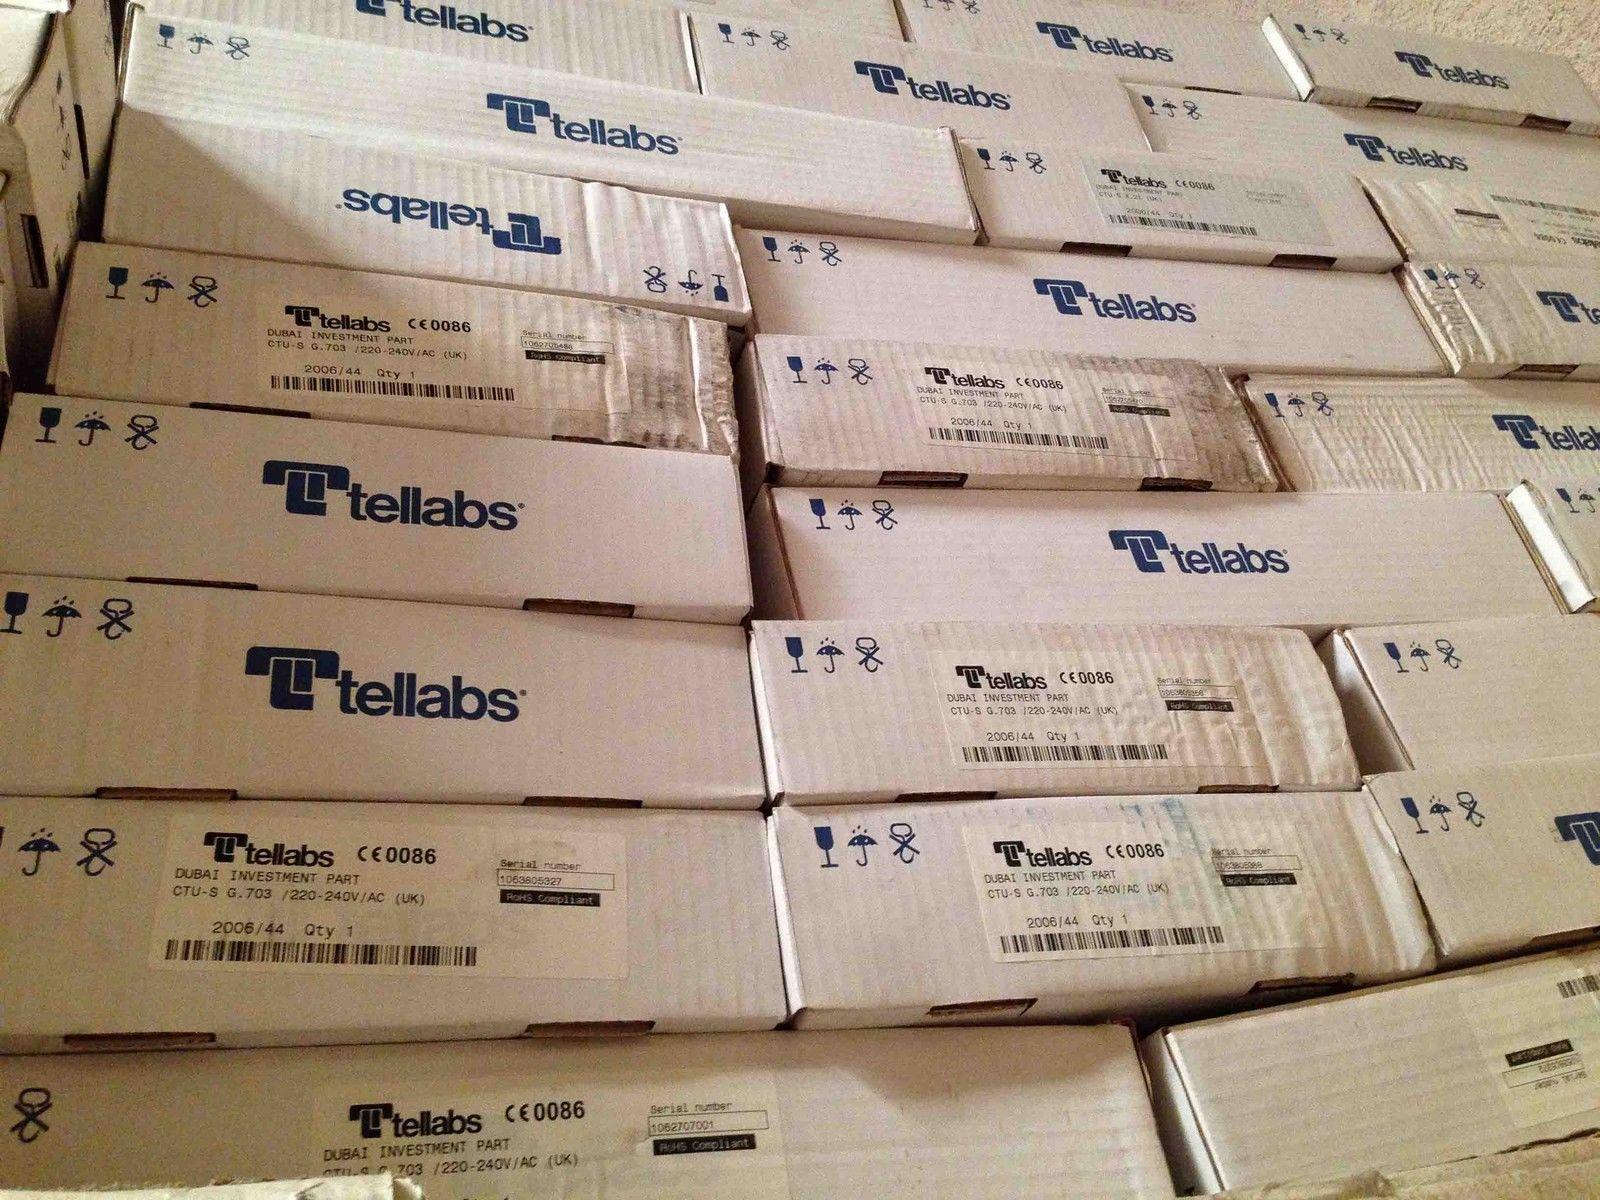 Tellabs 8110 network termination units ctu-s x.21